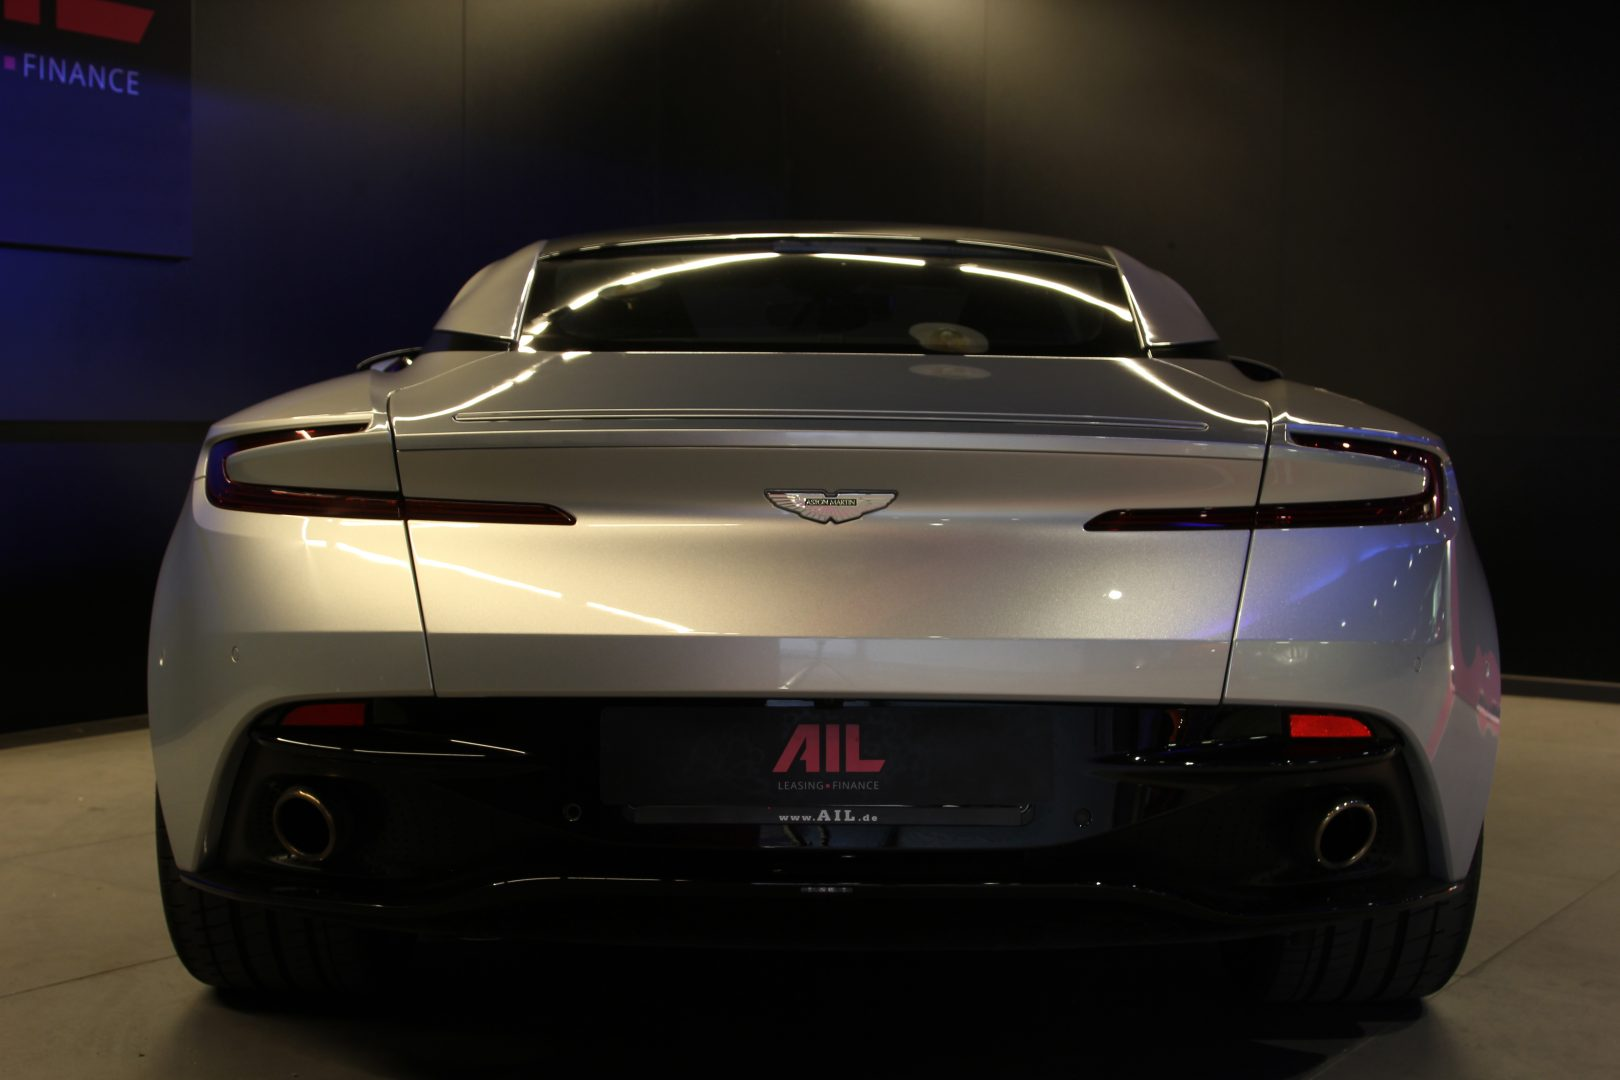 AIL Aston Martin DB11 Coupe 5.2 V12 2